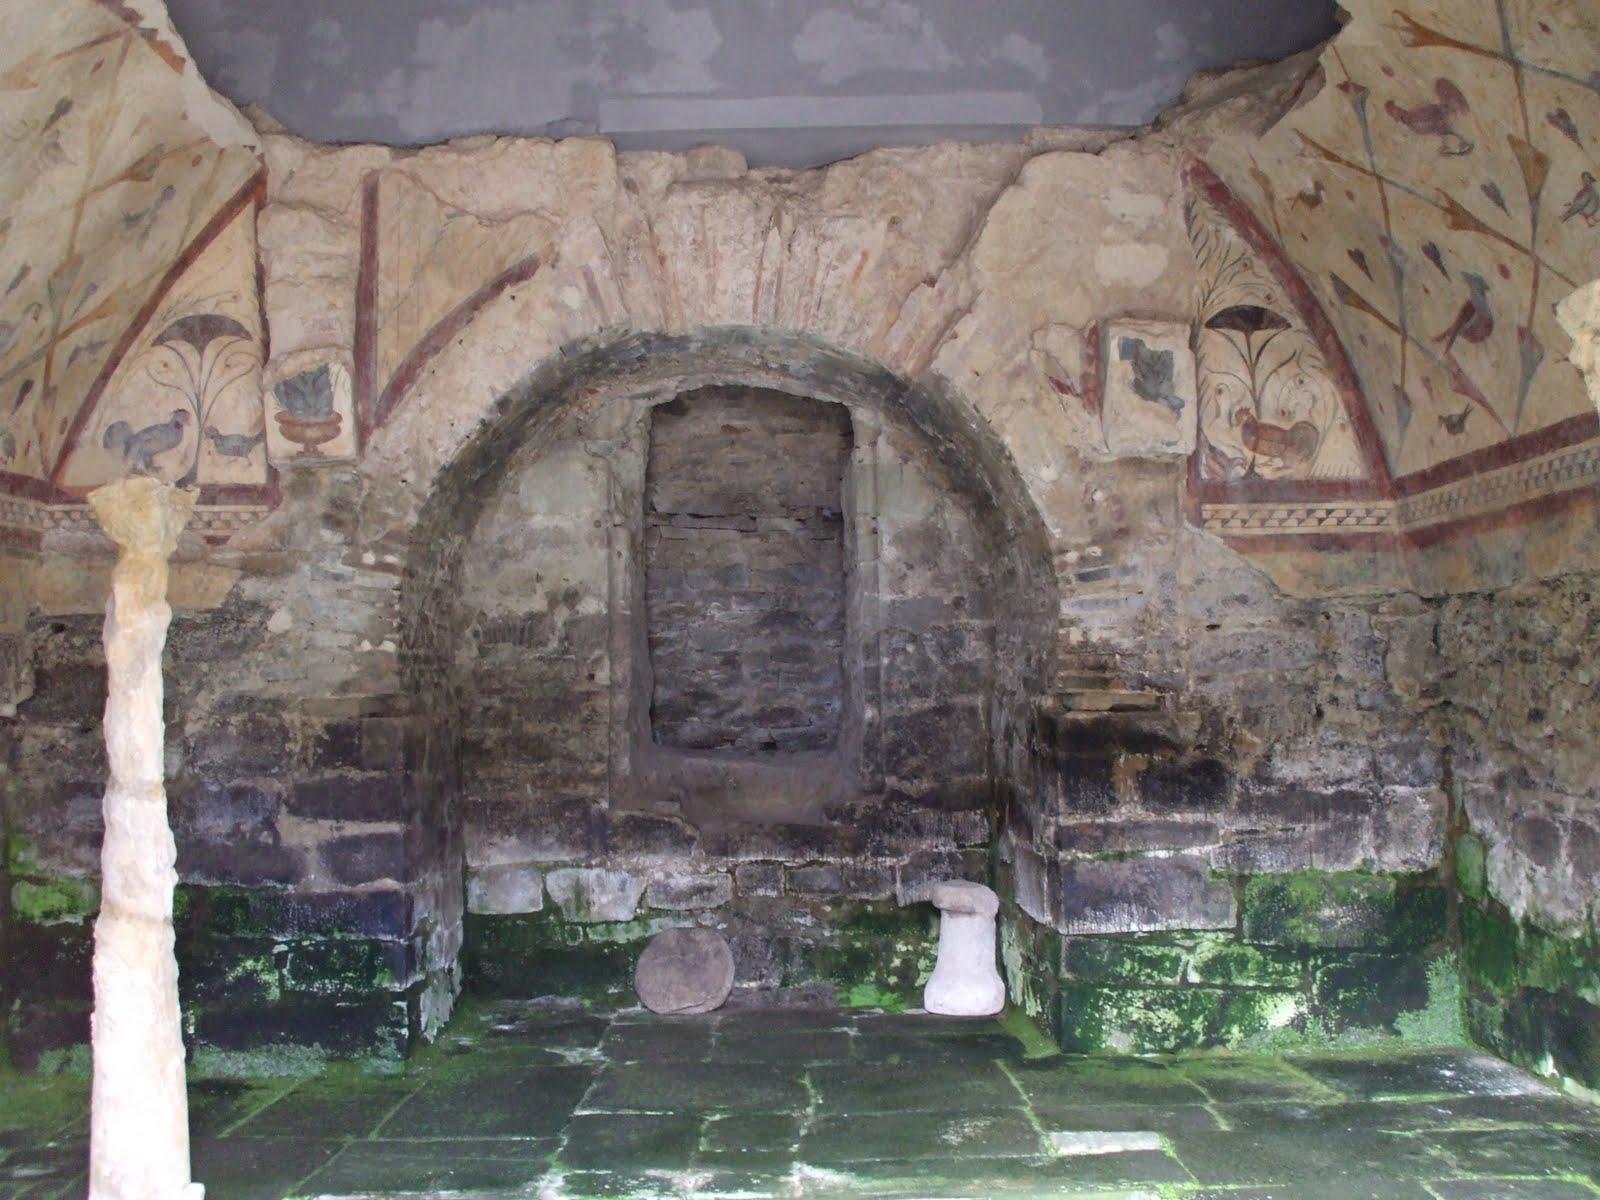 Santa Eulalia de Bóveda, Lugo